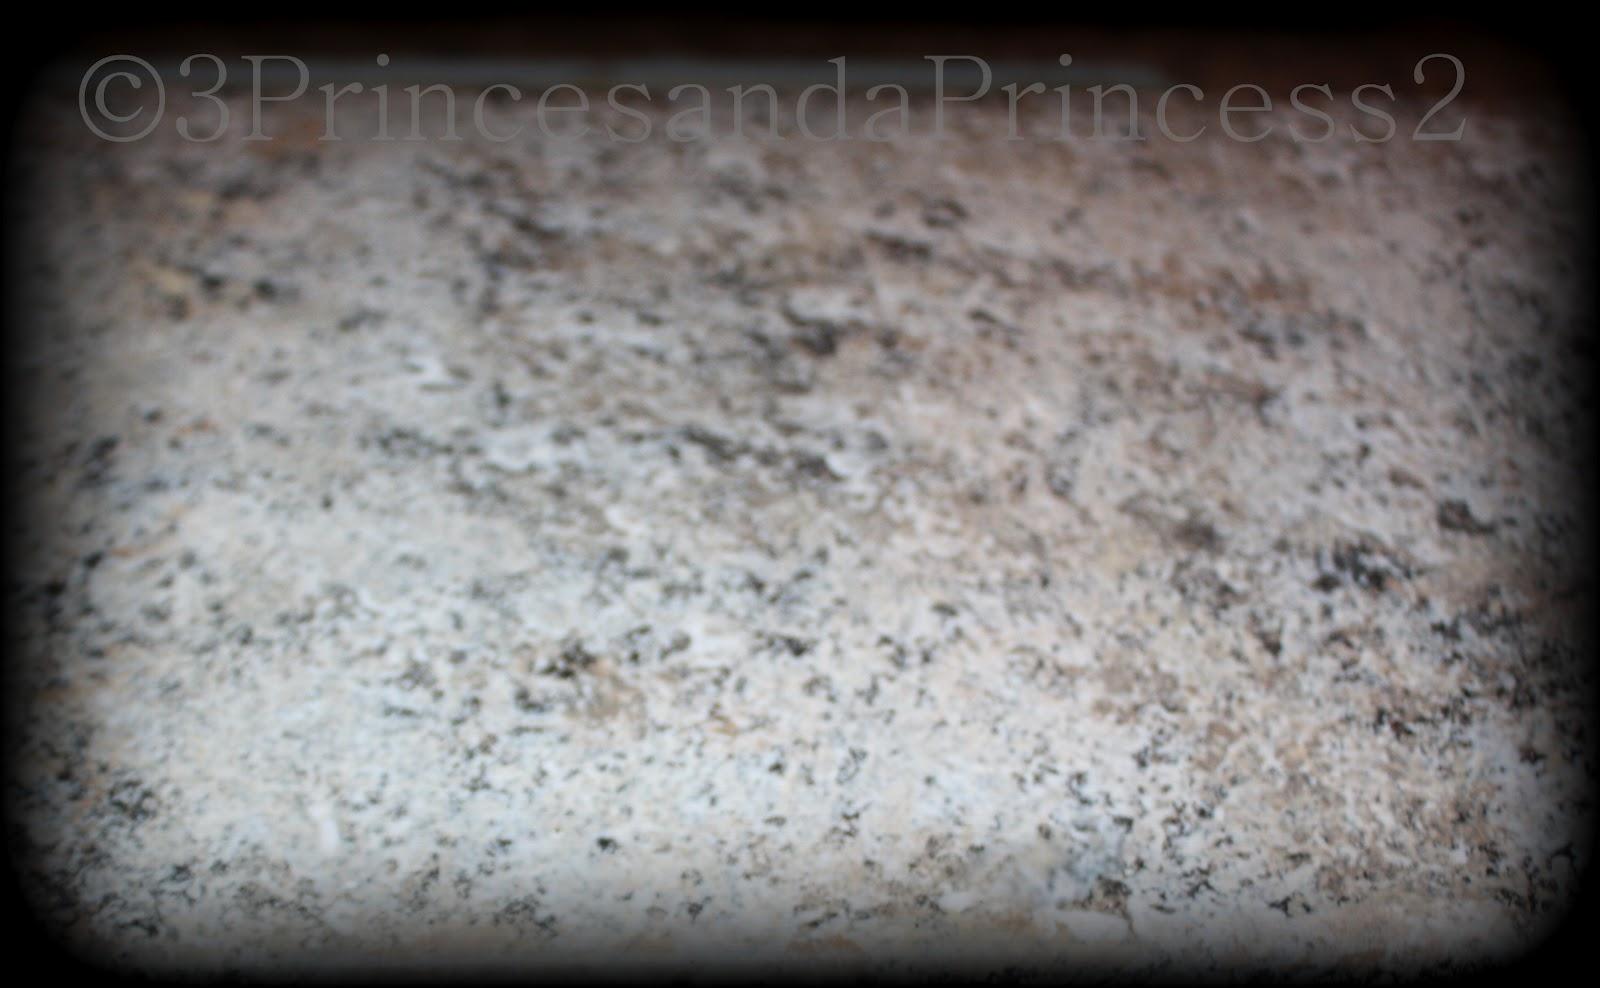 3 princes and a princess 2 giani granite a total for Giani granite